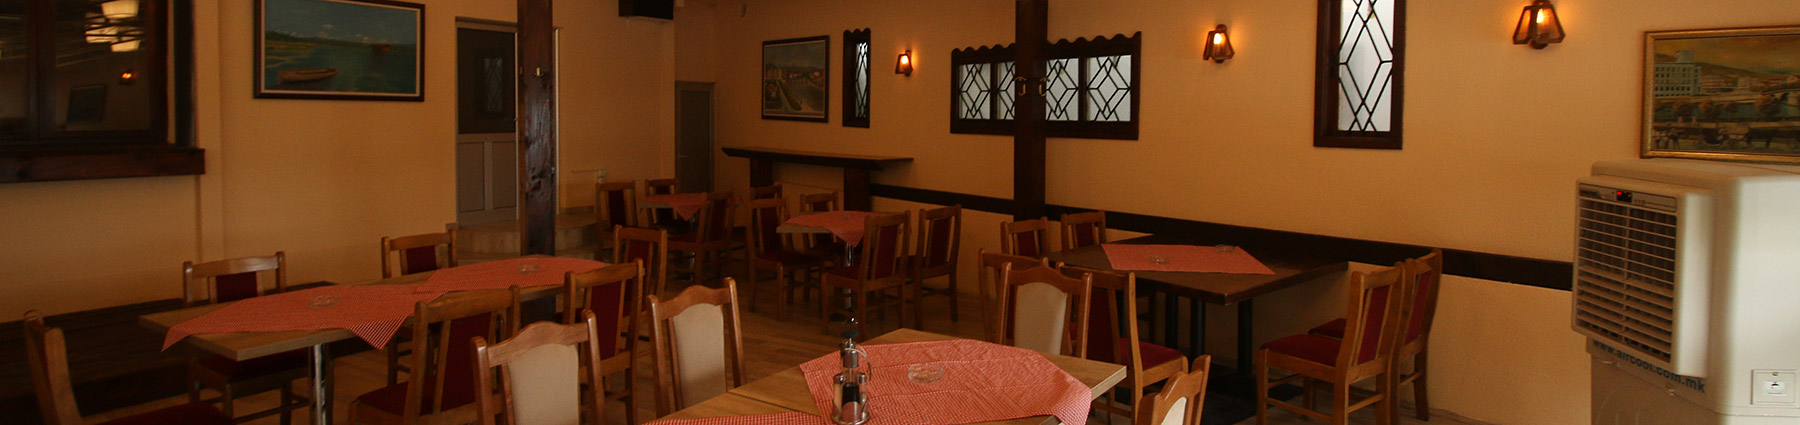 Ресторан Балкански